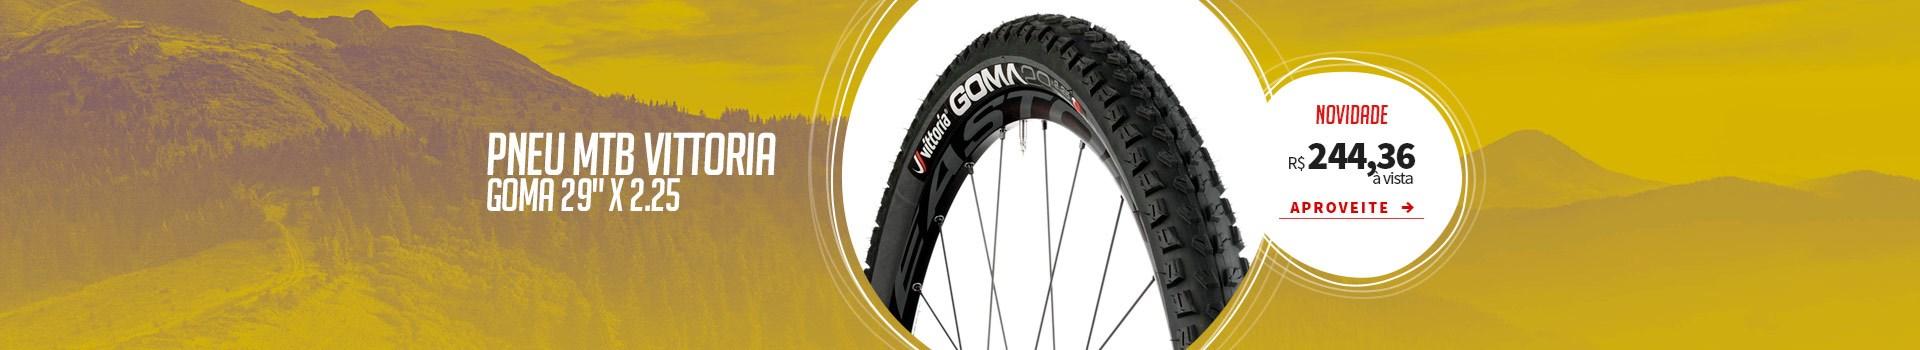 "Pneu Bike Vittoria Goma 29"" X 2.25 MTB"